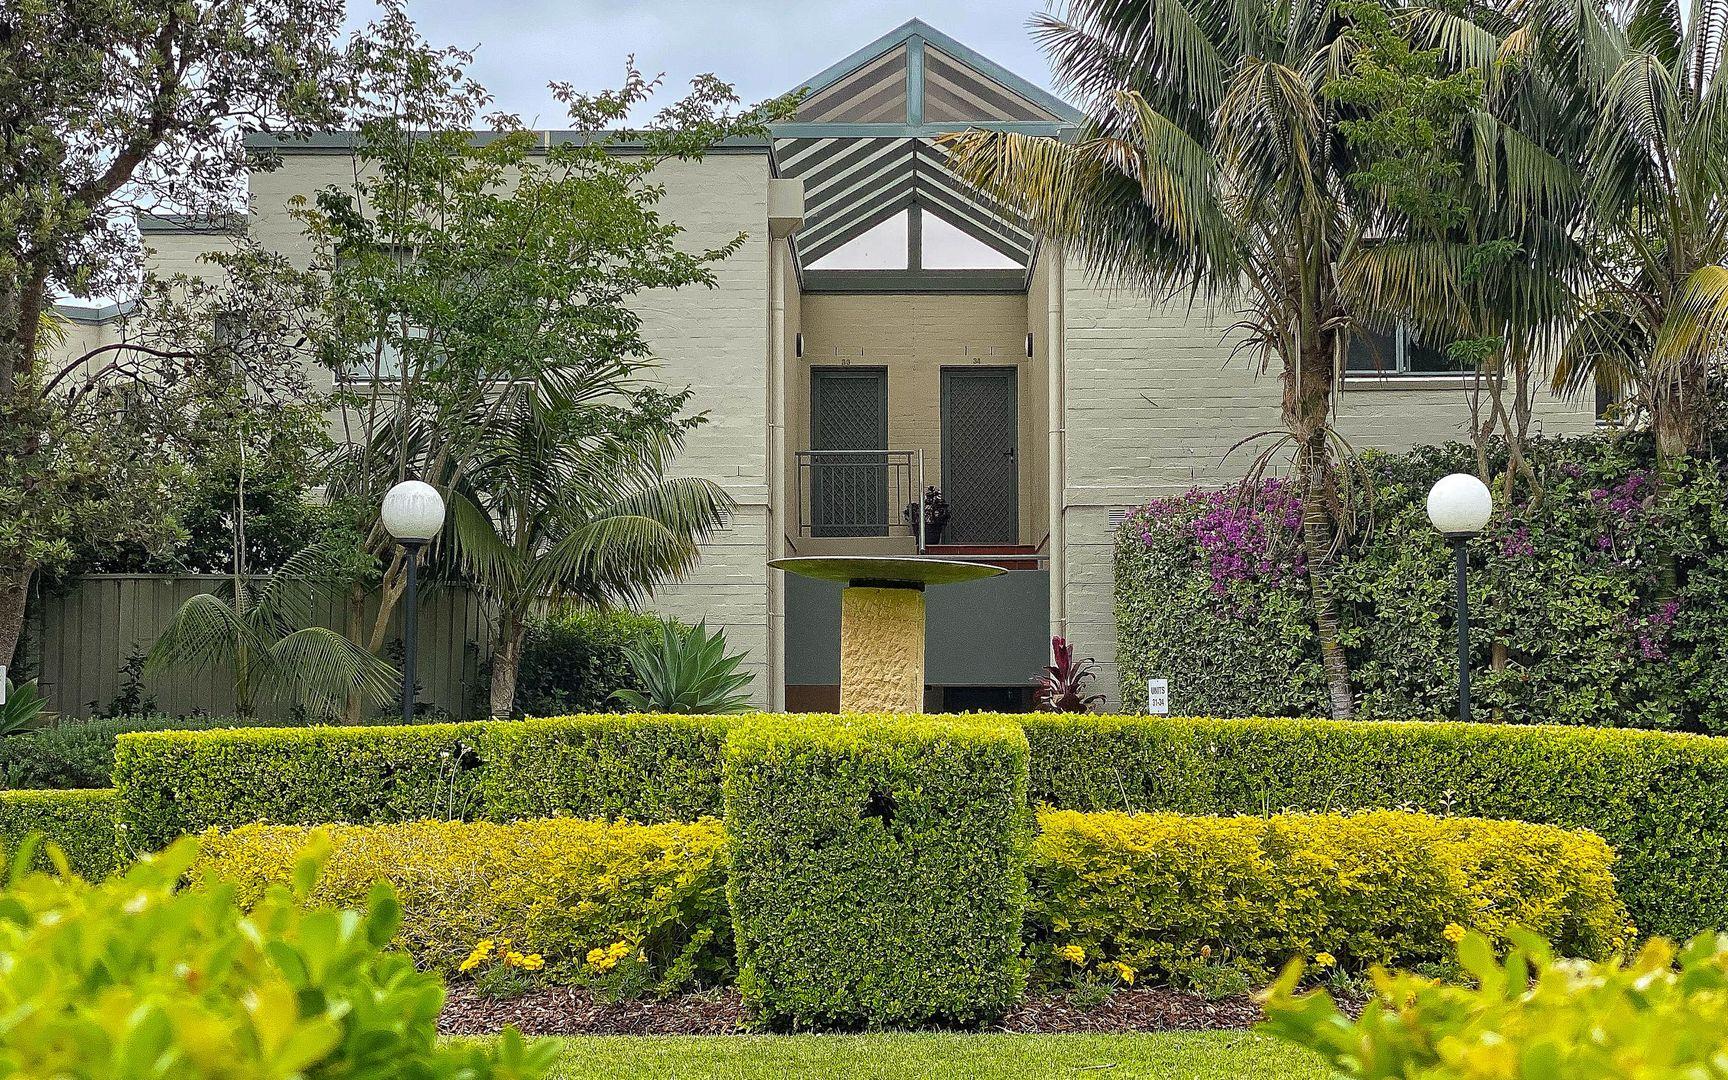 2/1 Wride Street, Maroubra NSW 2035, Image 0